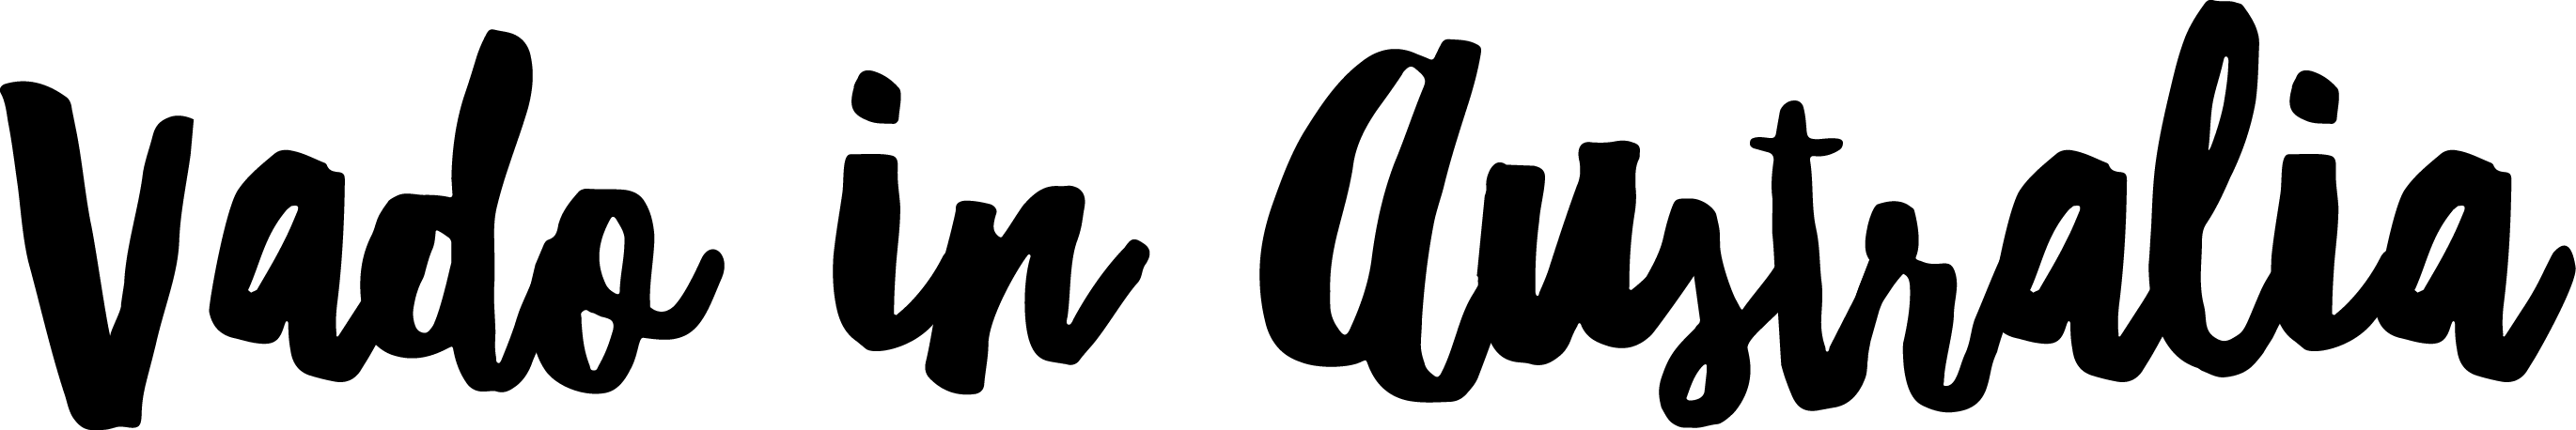 Vadoinaustralia